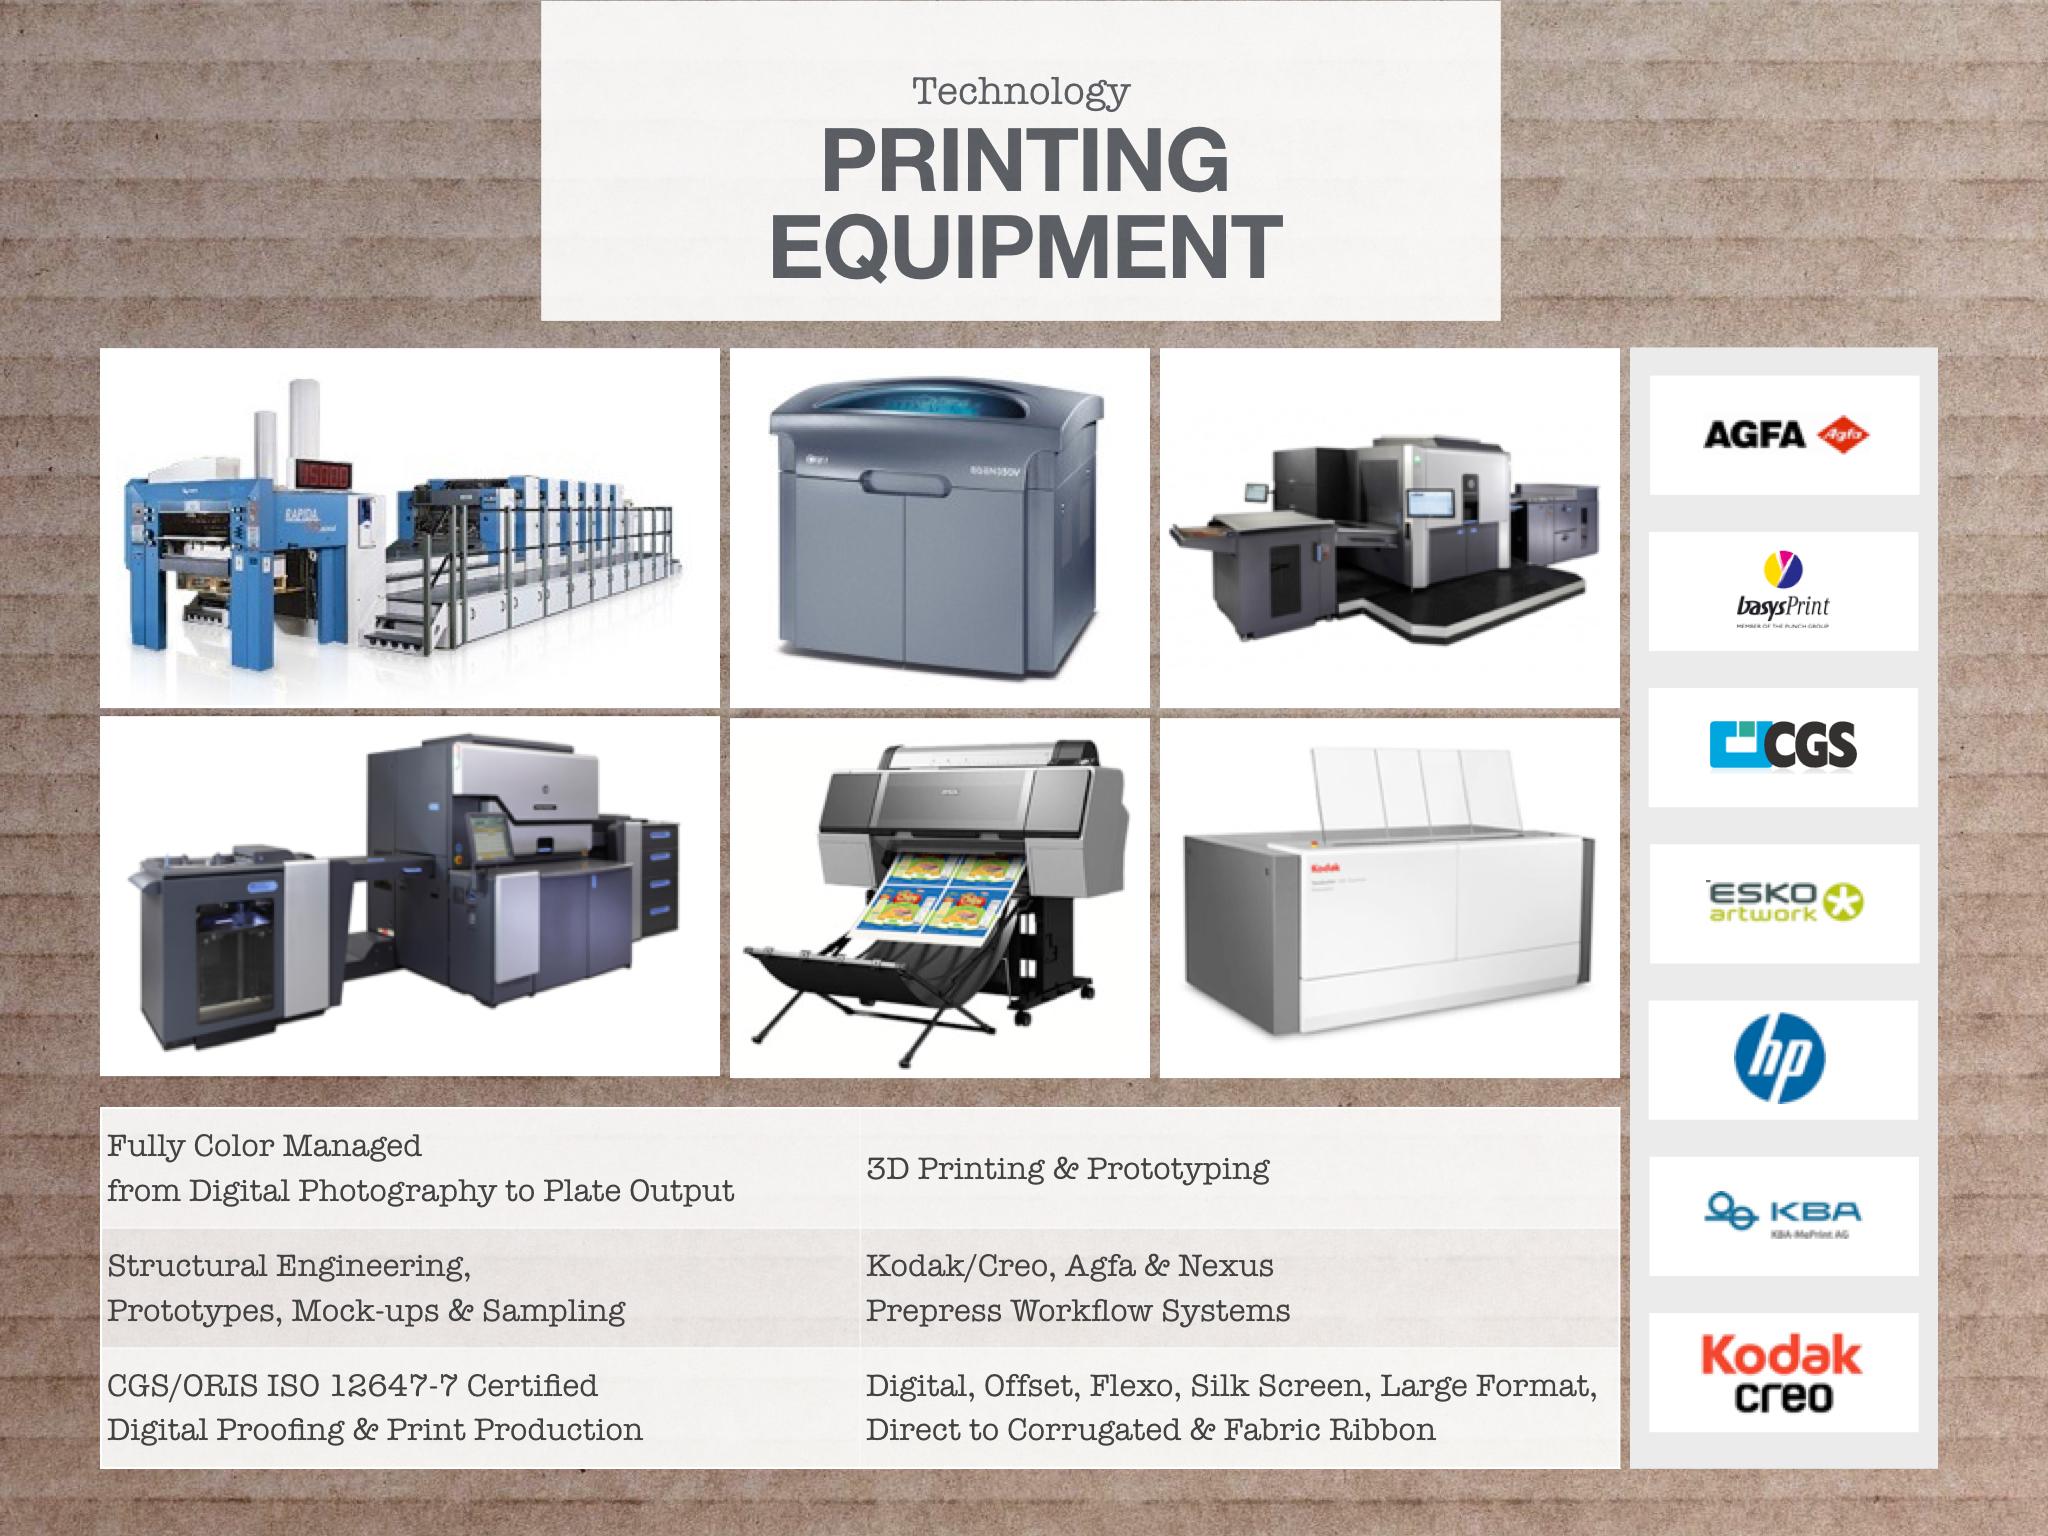 wsp-wprint-presentation-jpg.009.jpeg